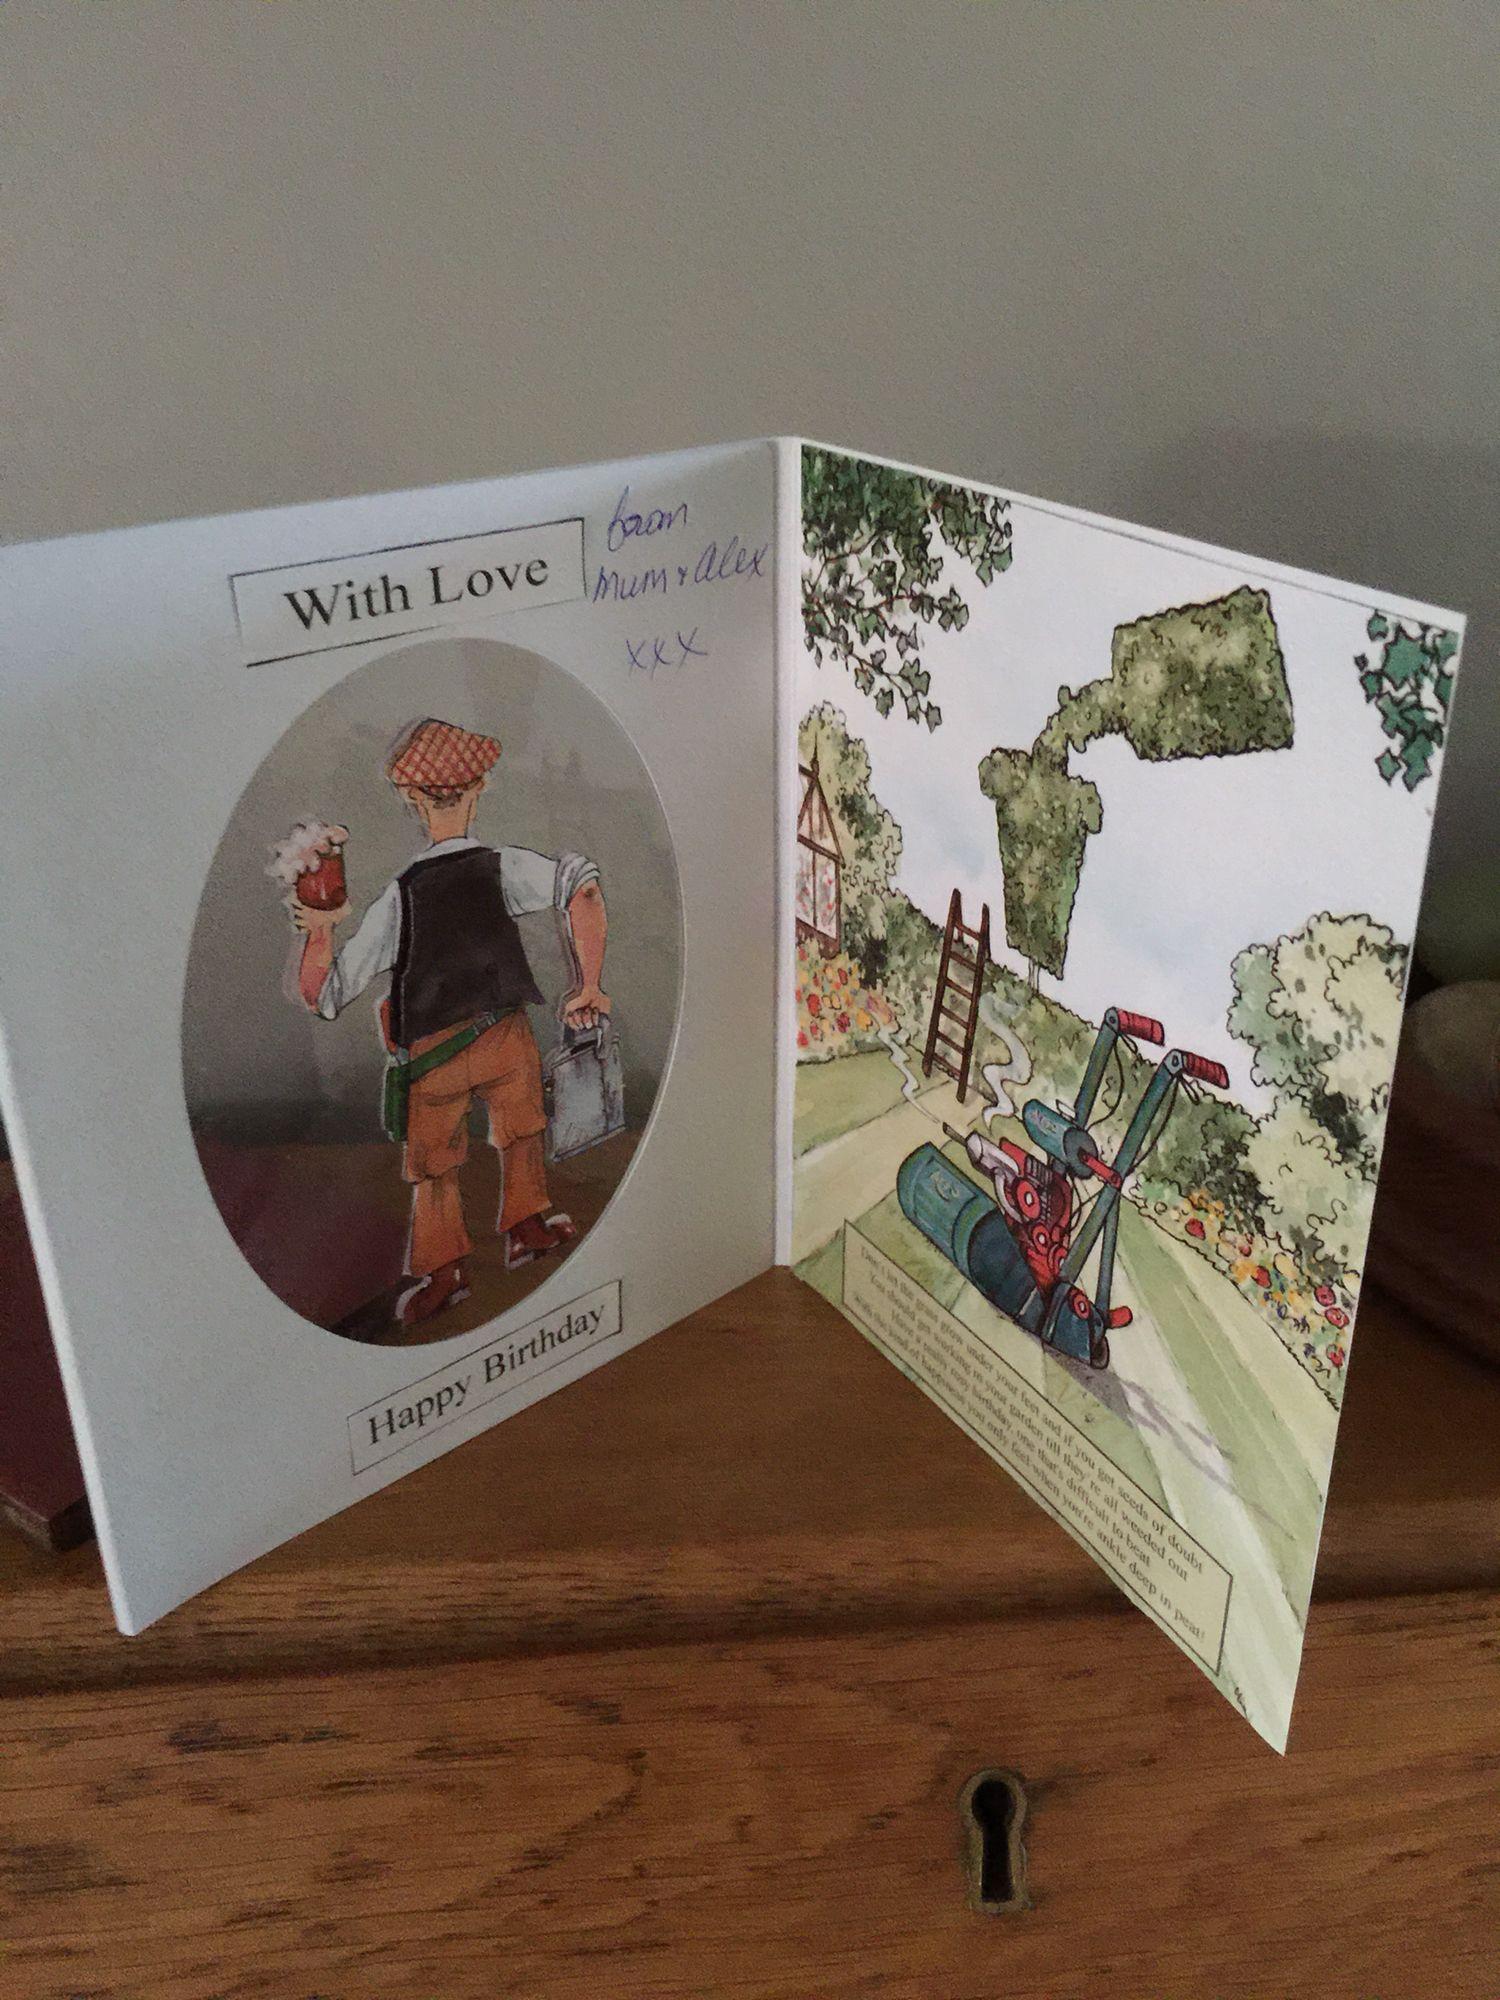 Backside/inside of card